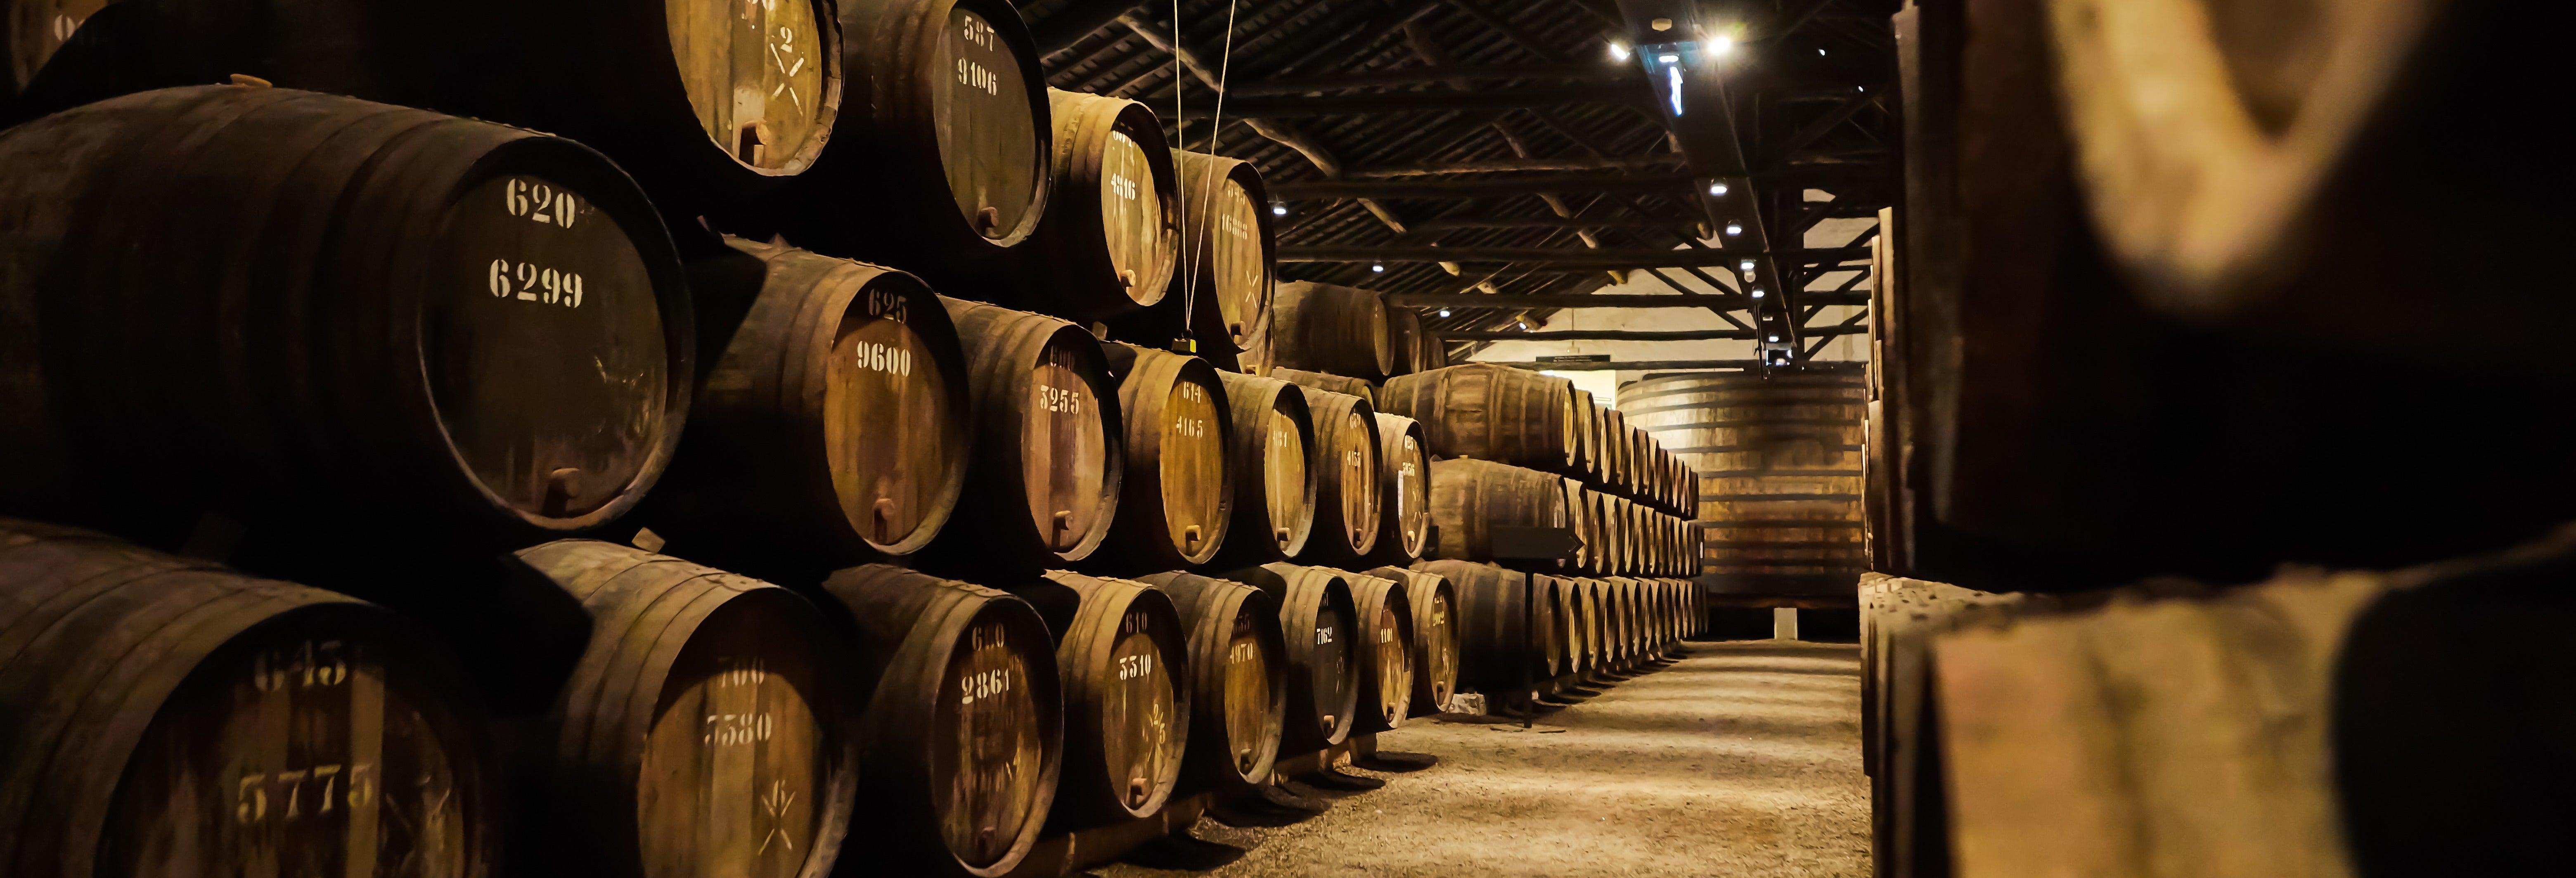 Tour de vinos + Visita a la bodega Fonseca